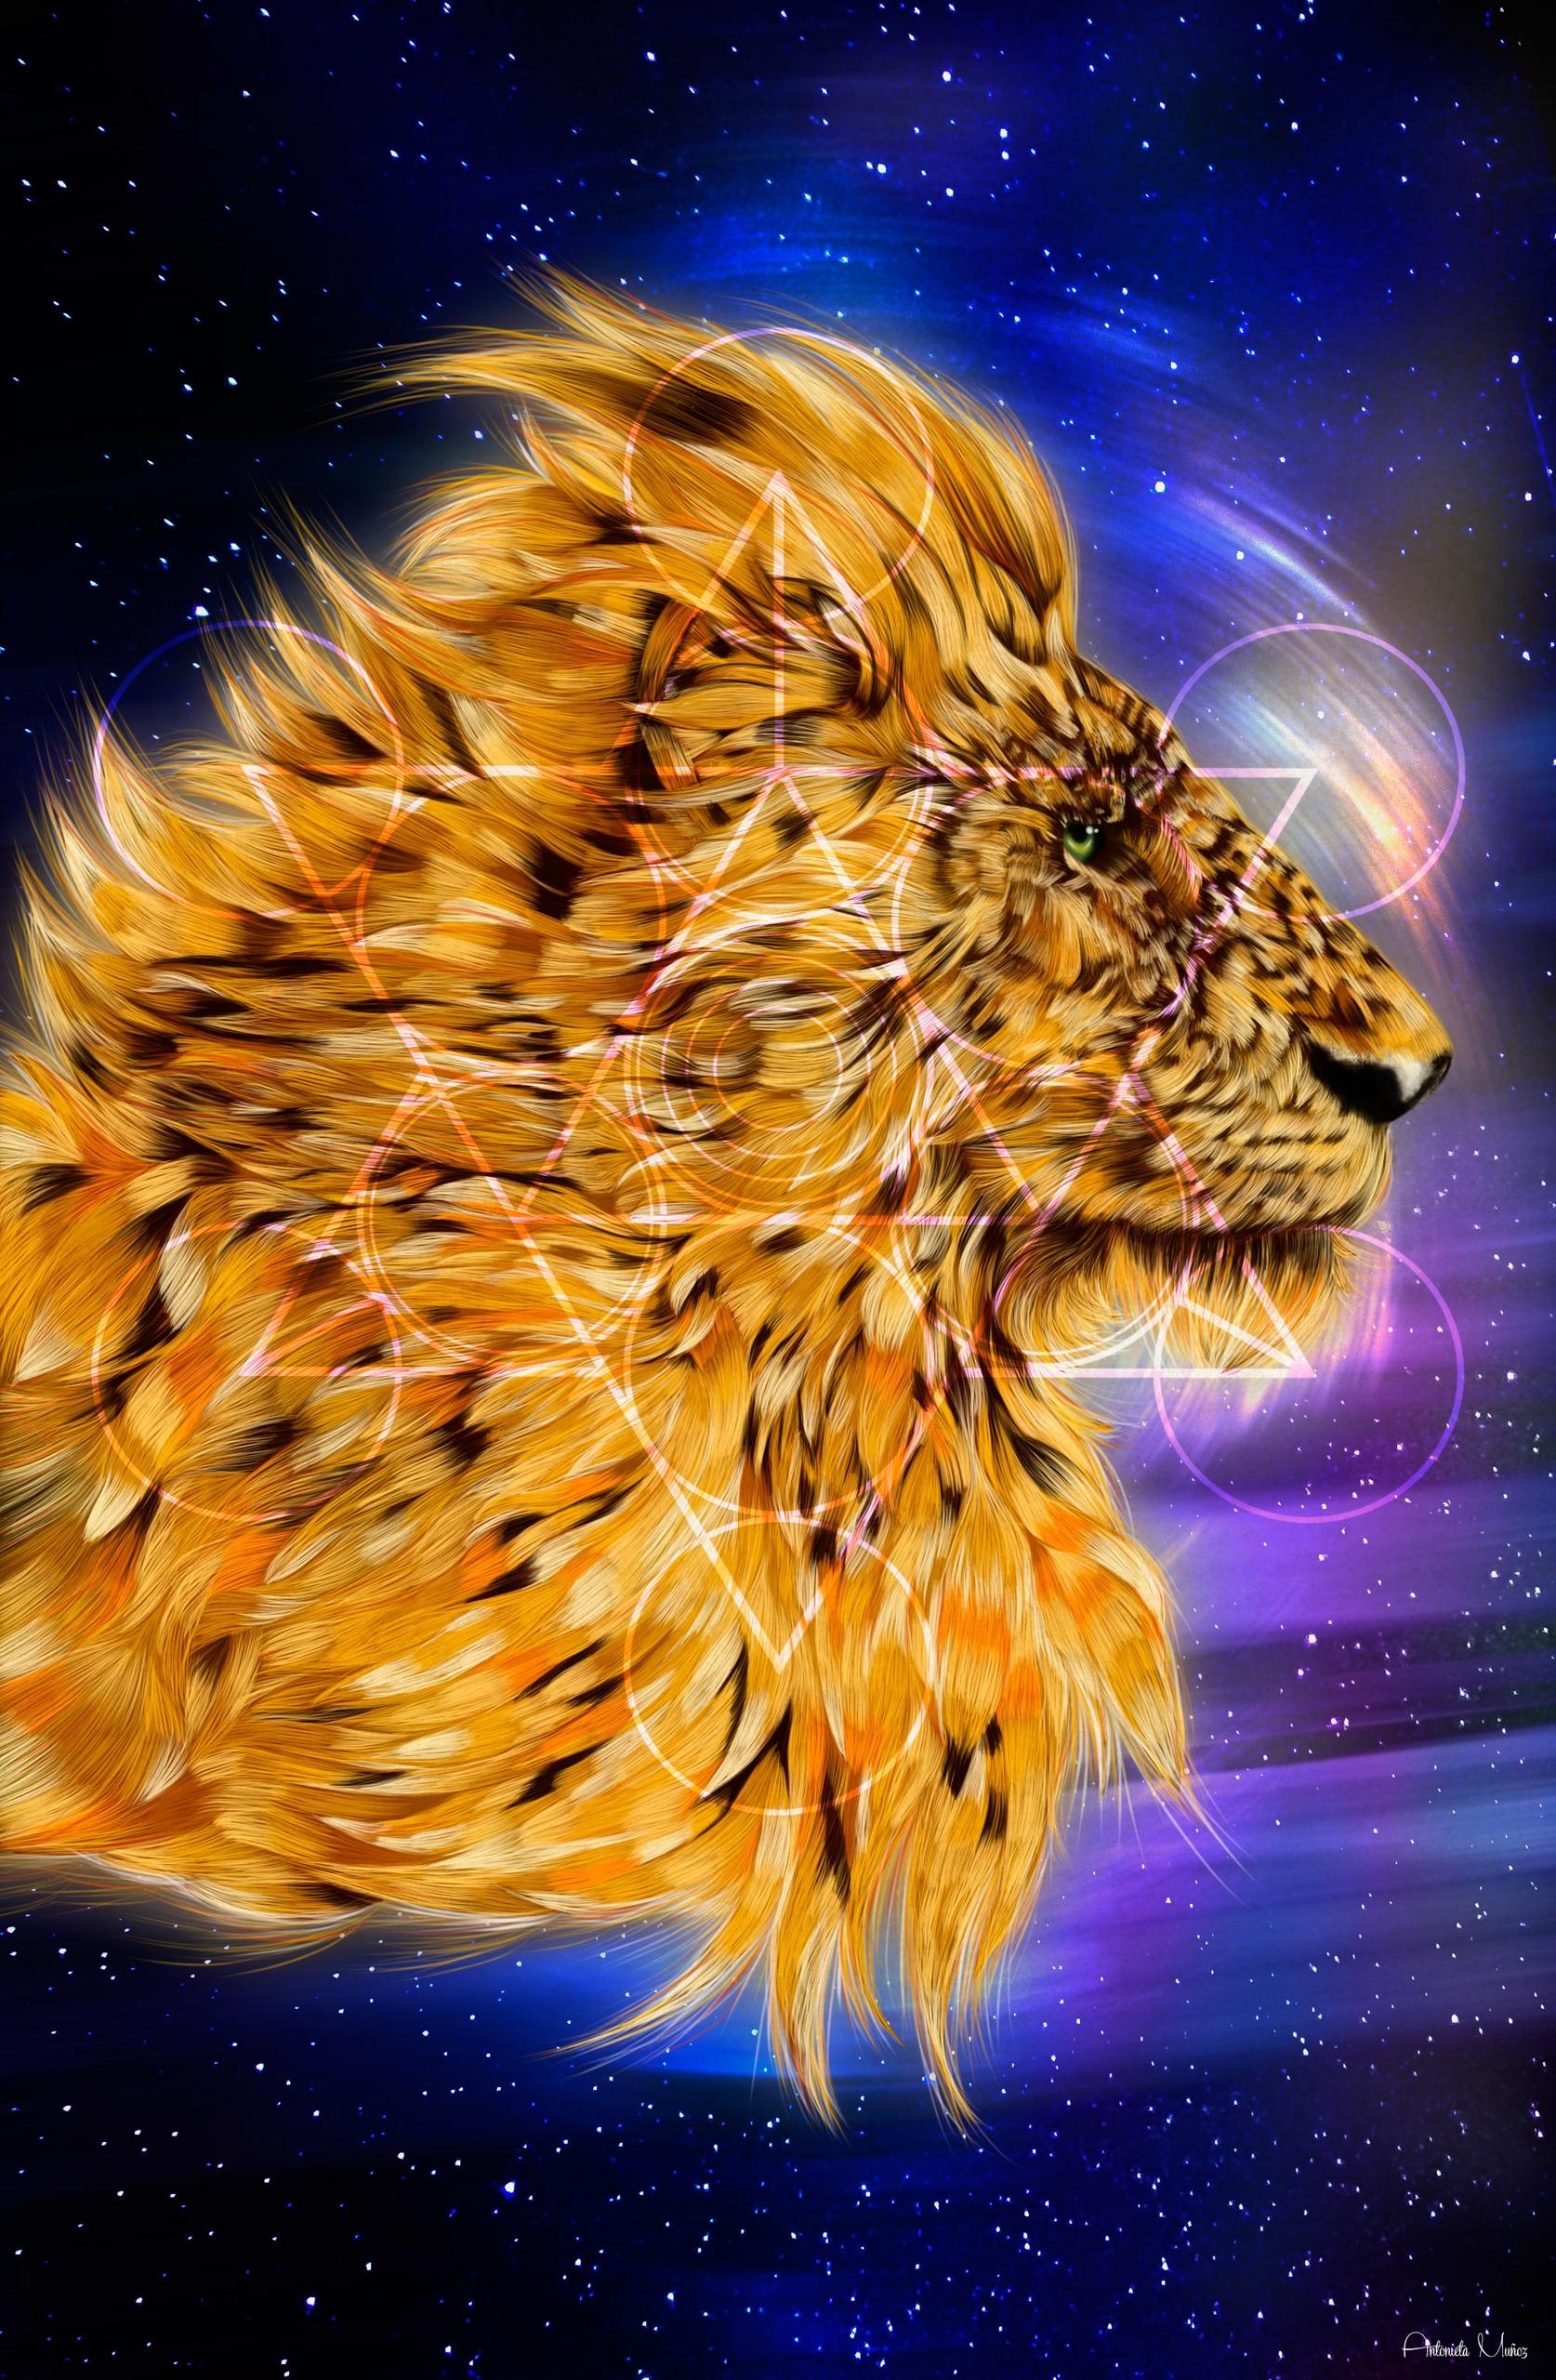 Cosmic Force - illustration, digitalart - kuukistudio | ello